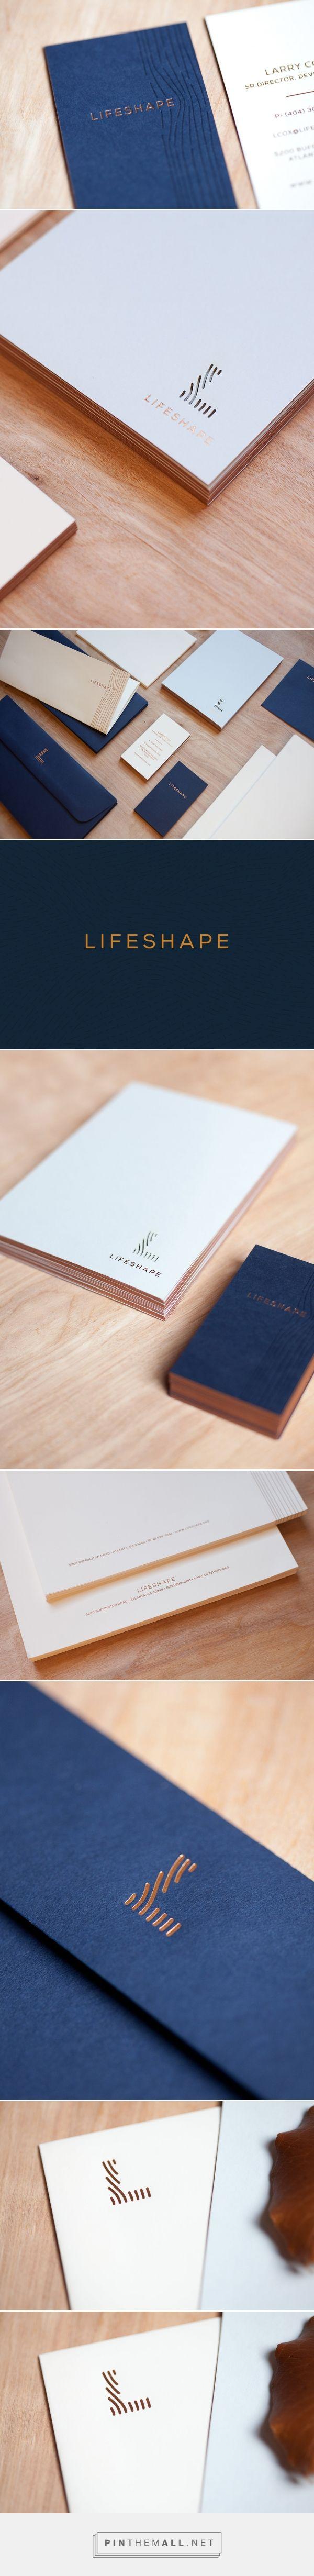 Lifeshape Branding by Peck & Company | Fivestar Branding – Design and Branding Agency & Inspiration Gallery